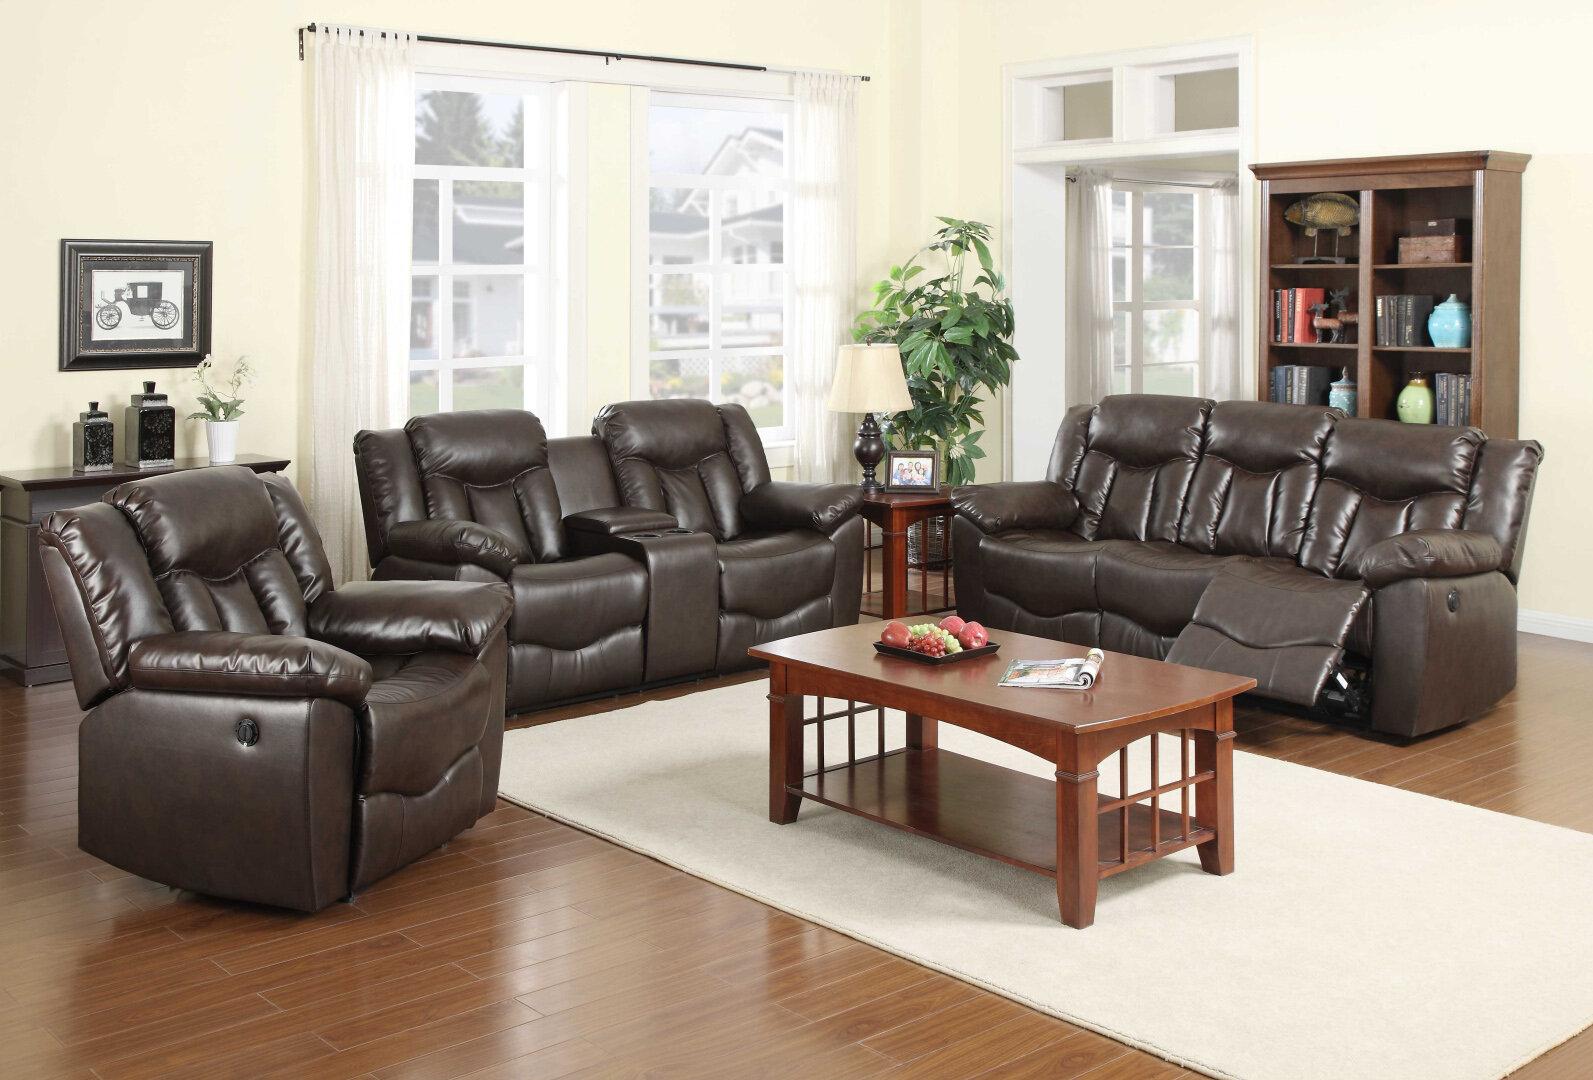 NathanielHome James 3 Piece Living Room Set | Wayfair